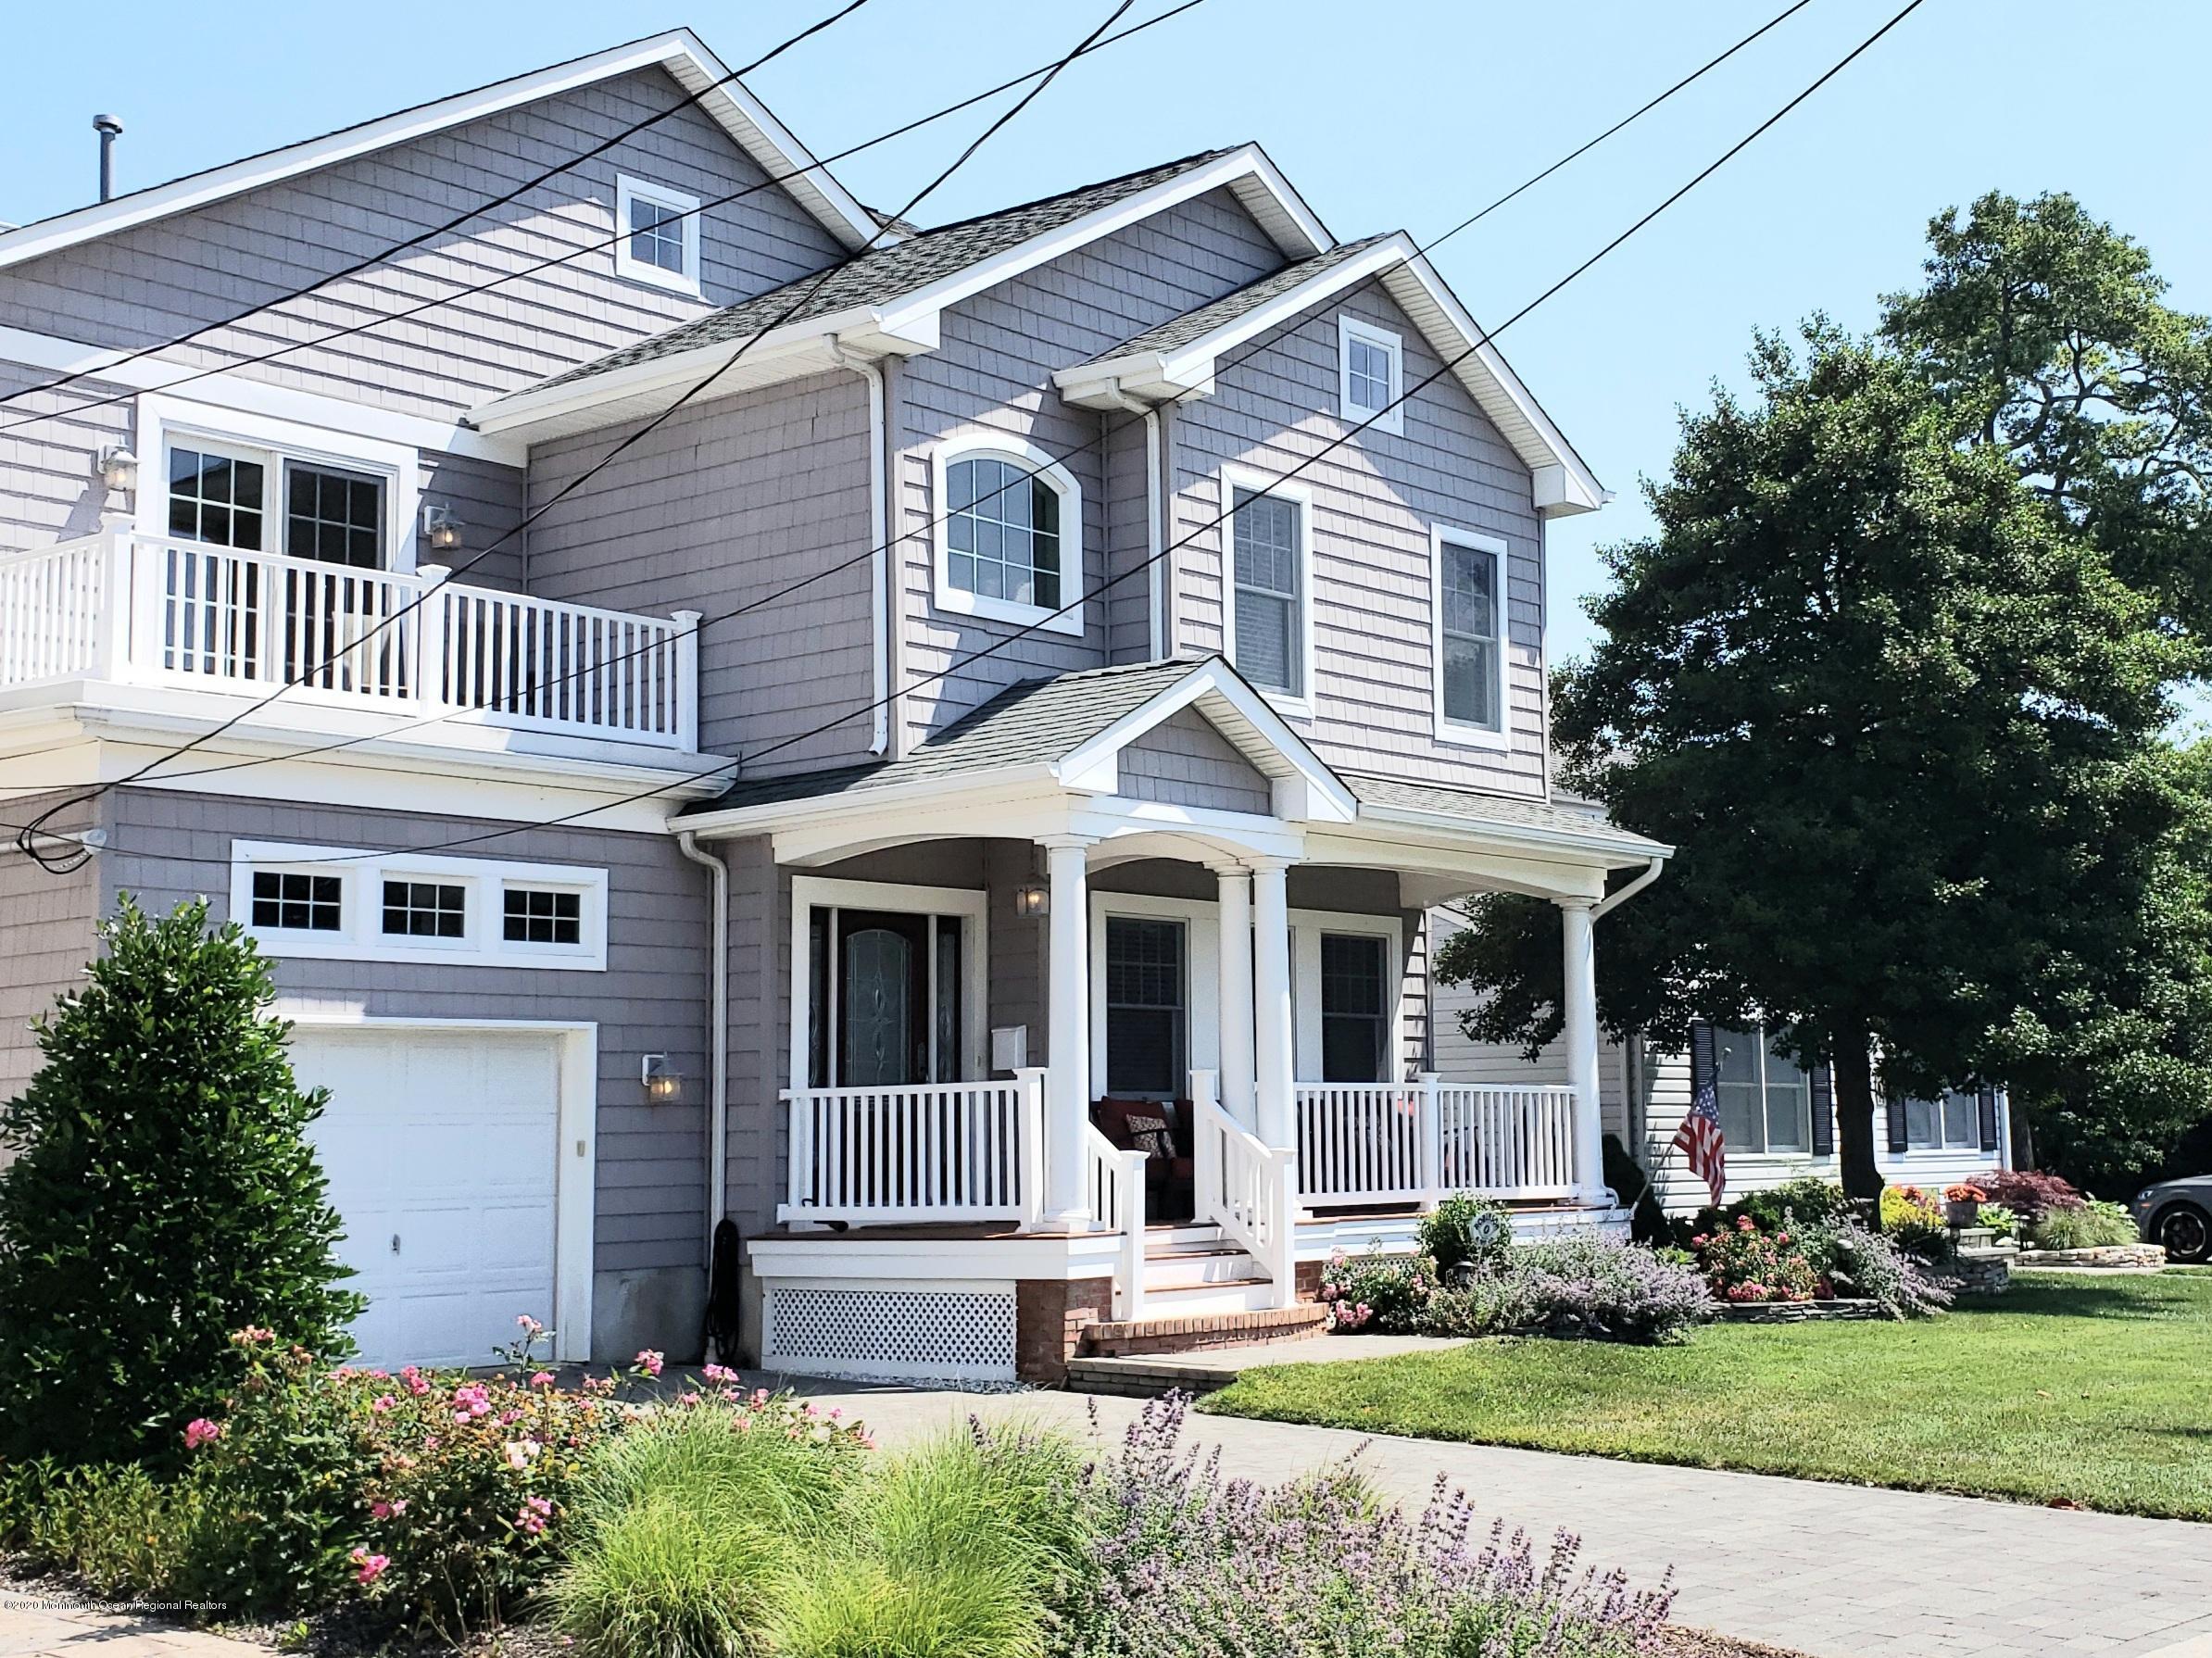 Photo of 203 Homestead Avenue, Point Pleasant Beach, NJ 08742